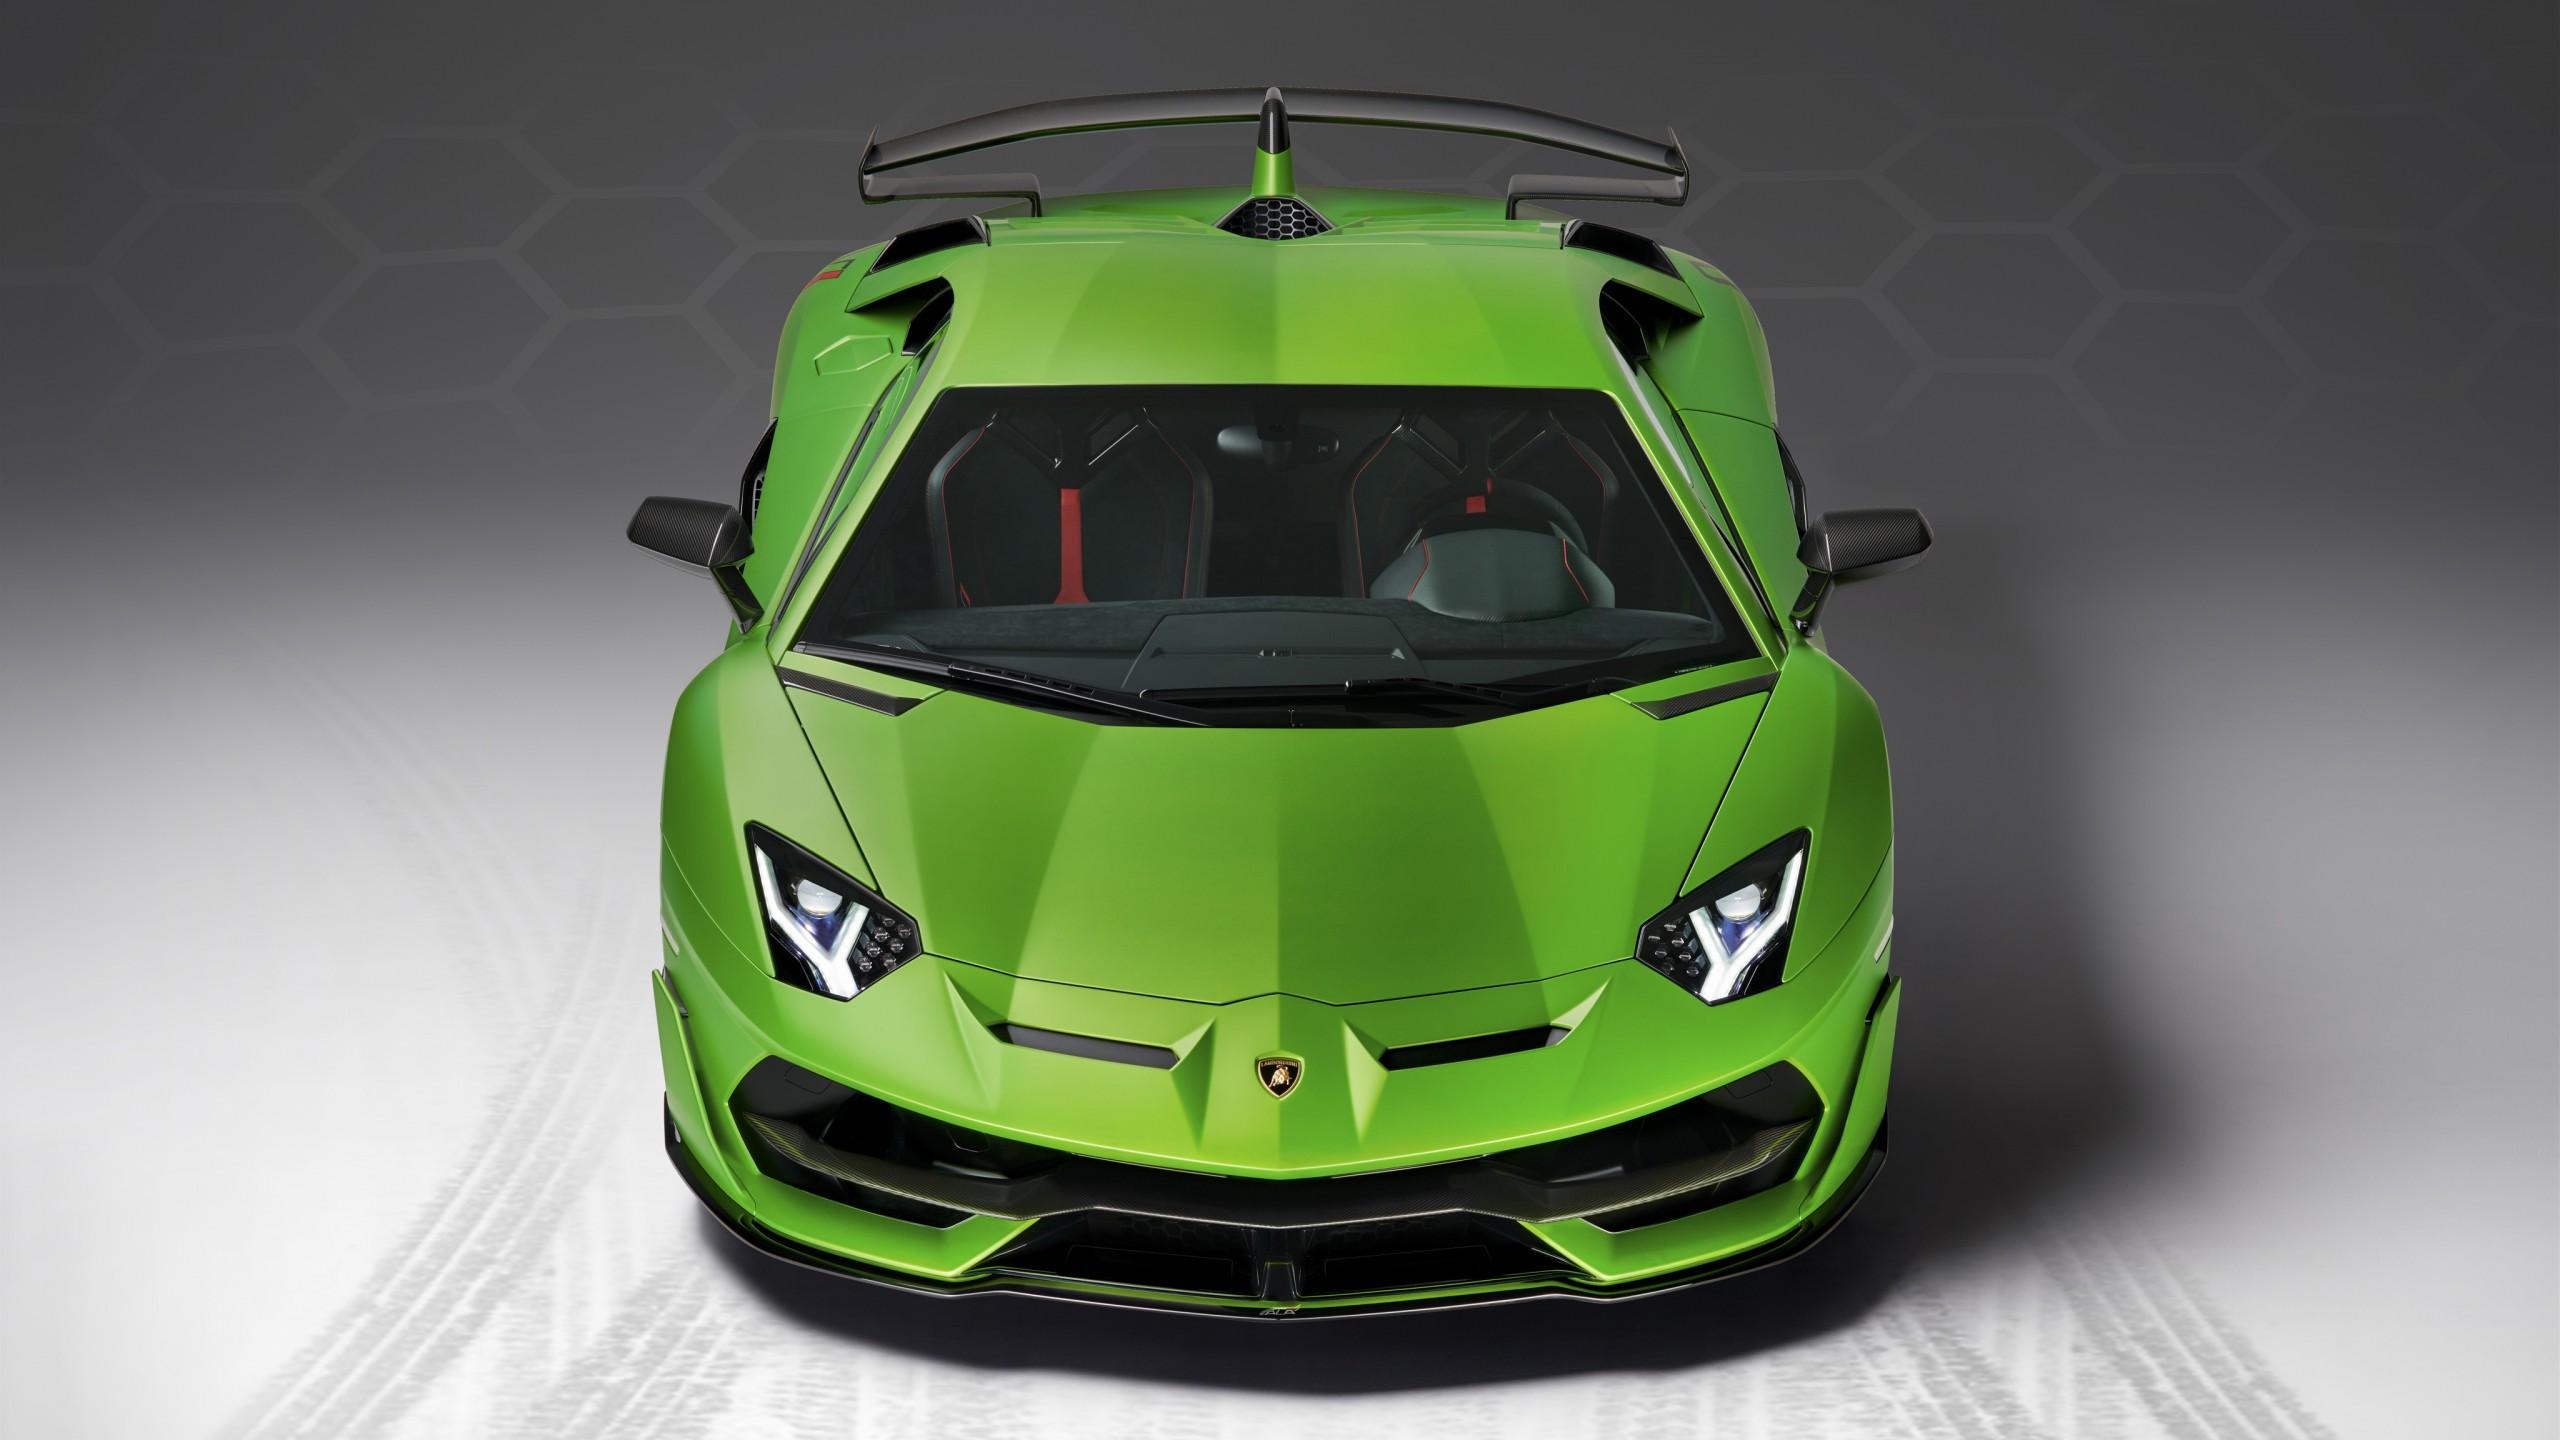 2019 Lamborghini Aventador SVJ 4K Wallpaper | HD Car ...